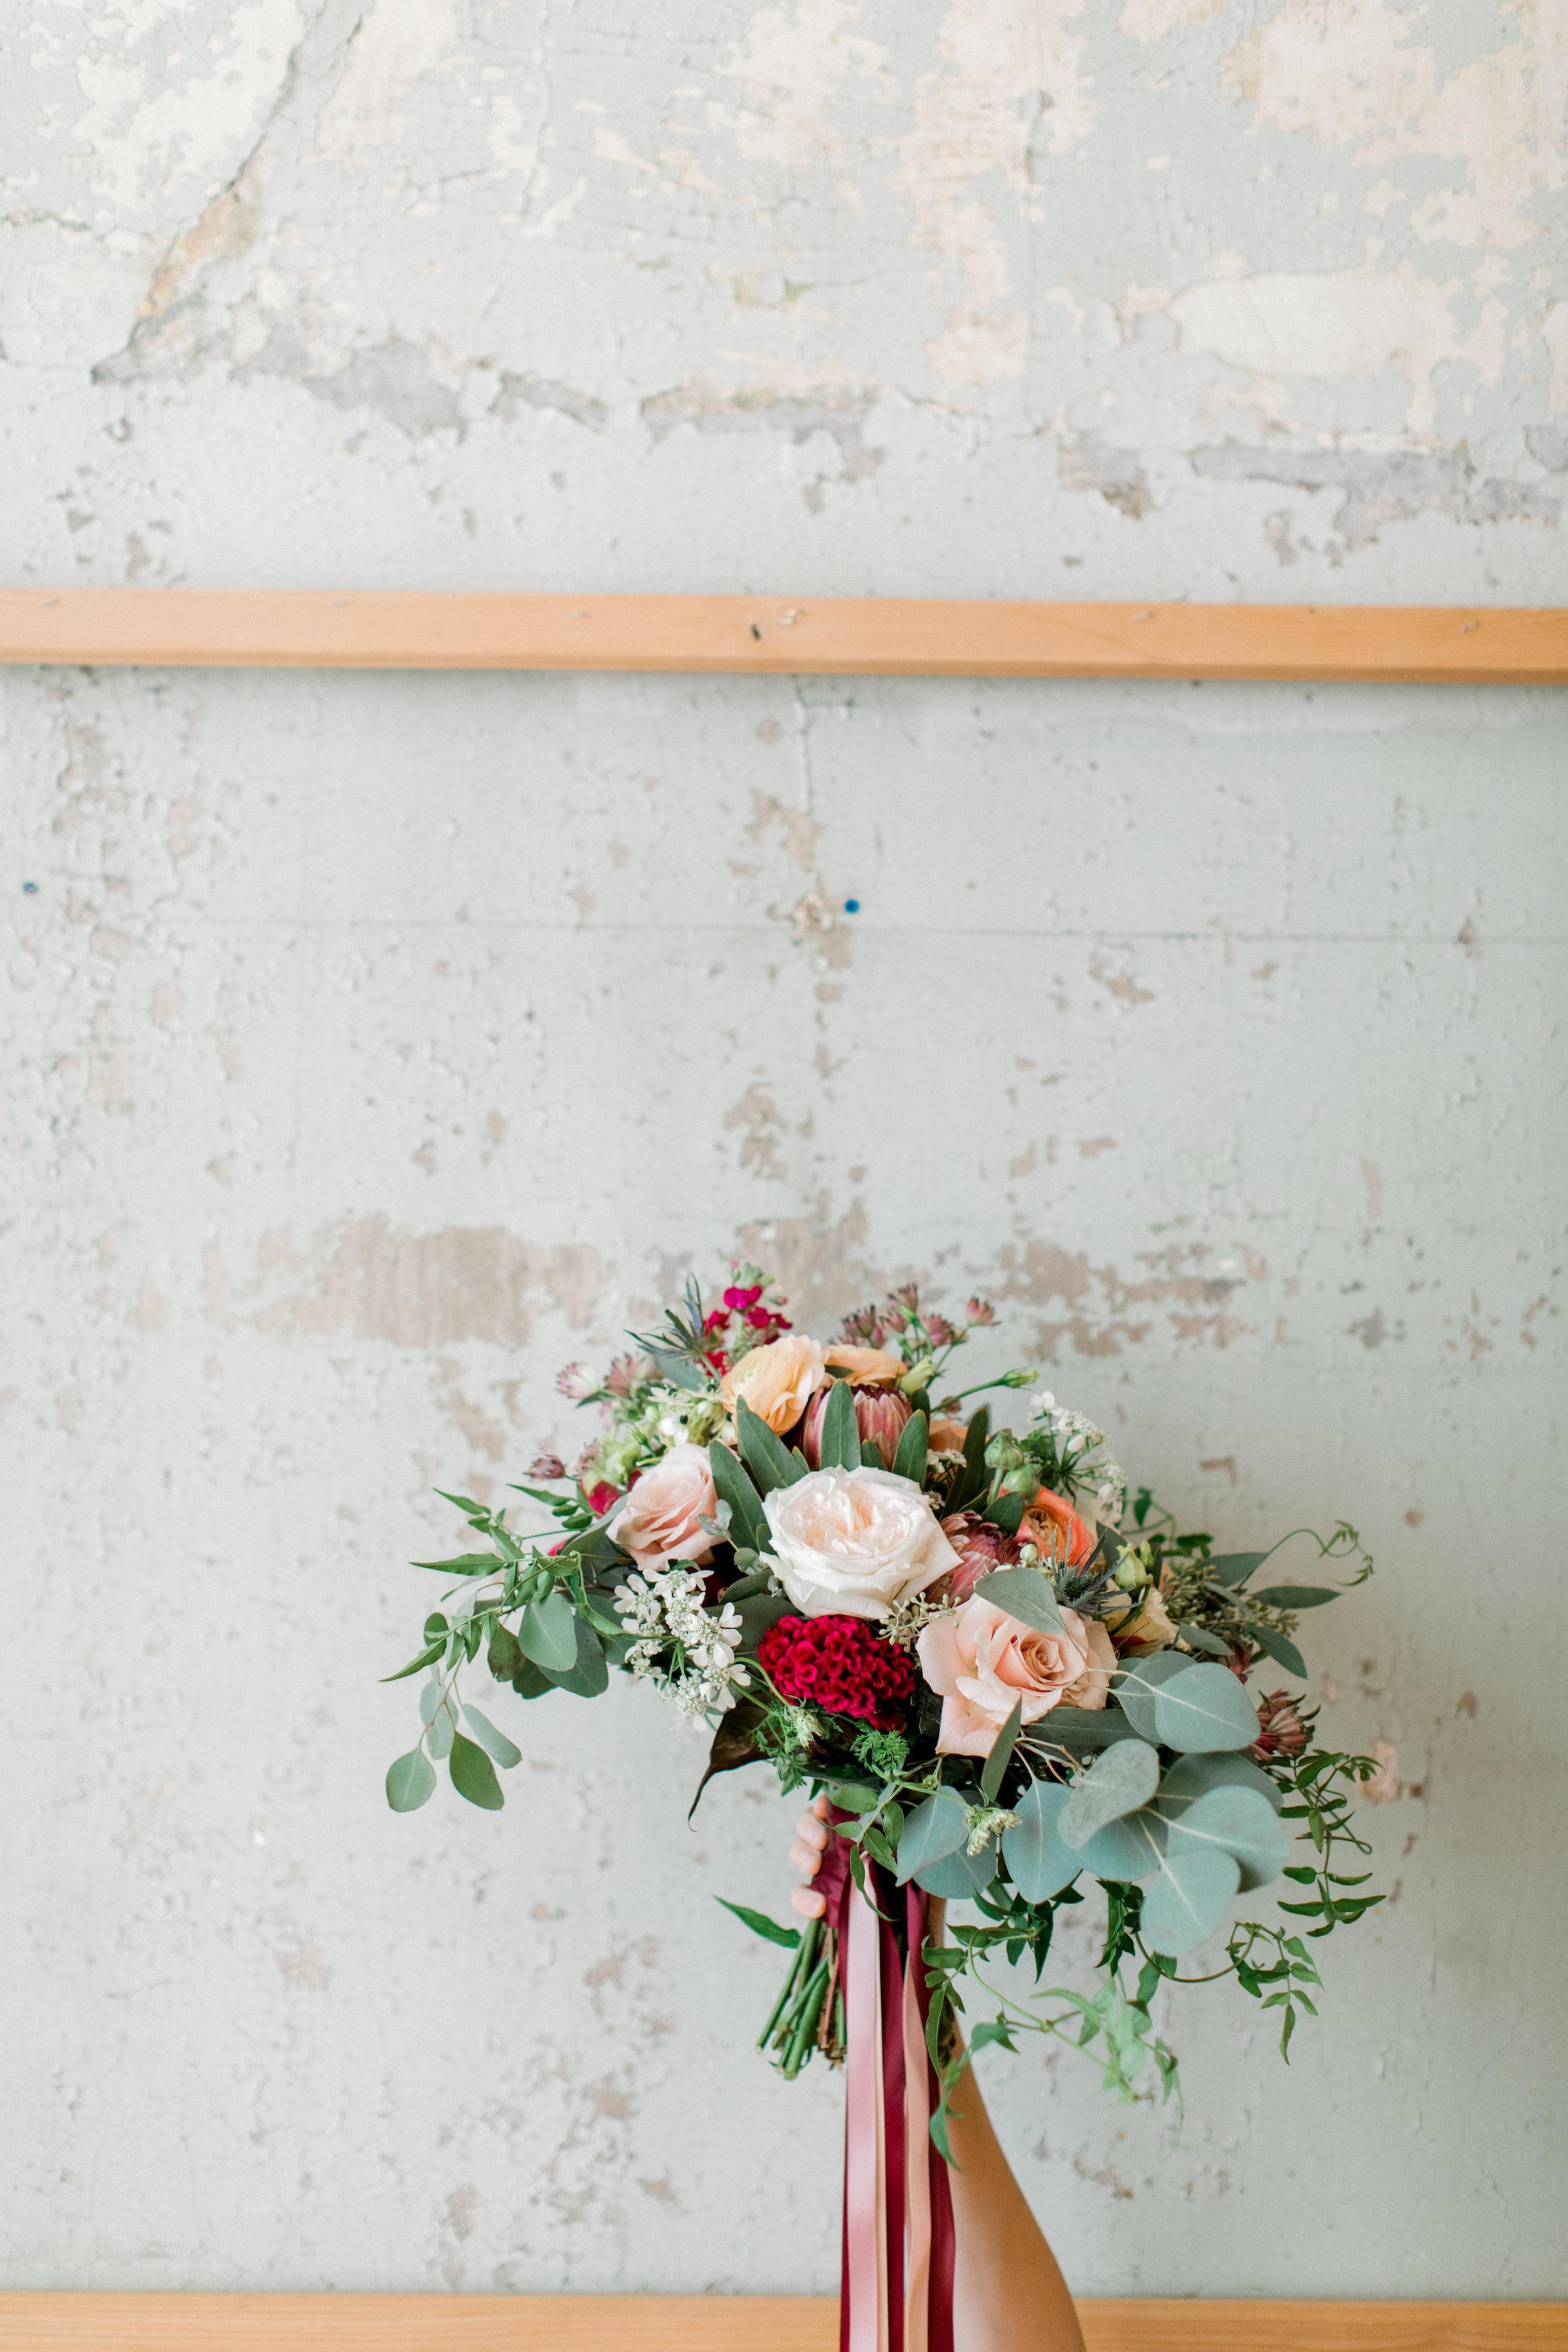 Ryan Alexa Married-Getting Ready First Look-0119.jpg